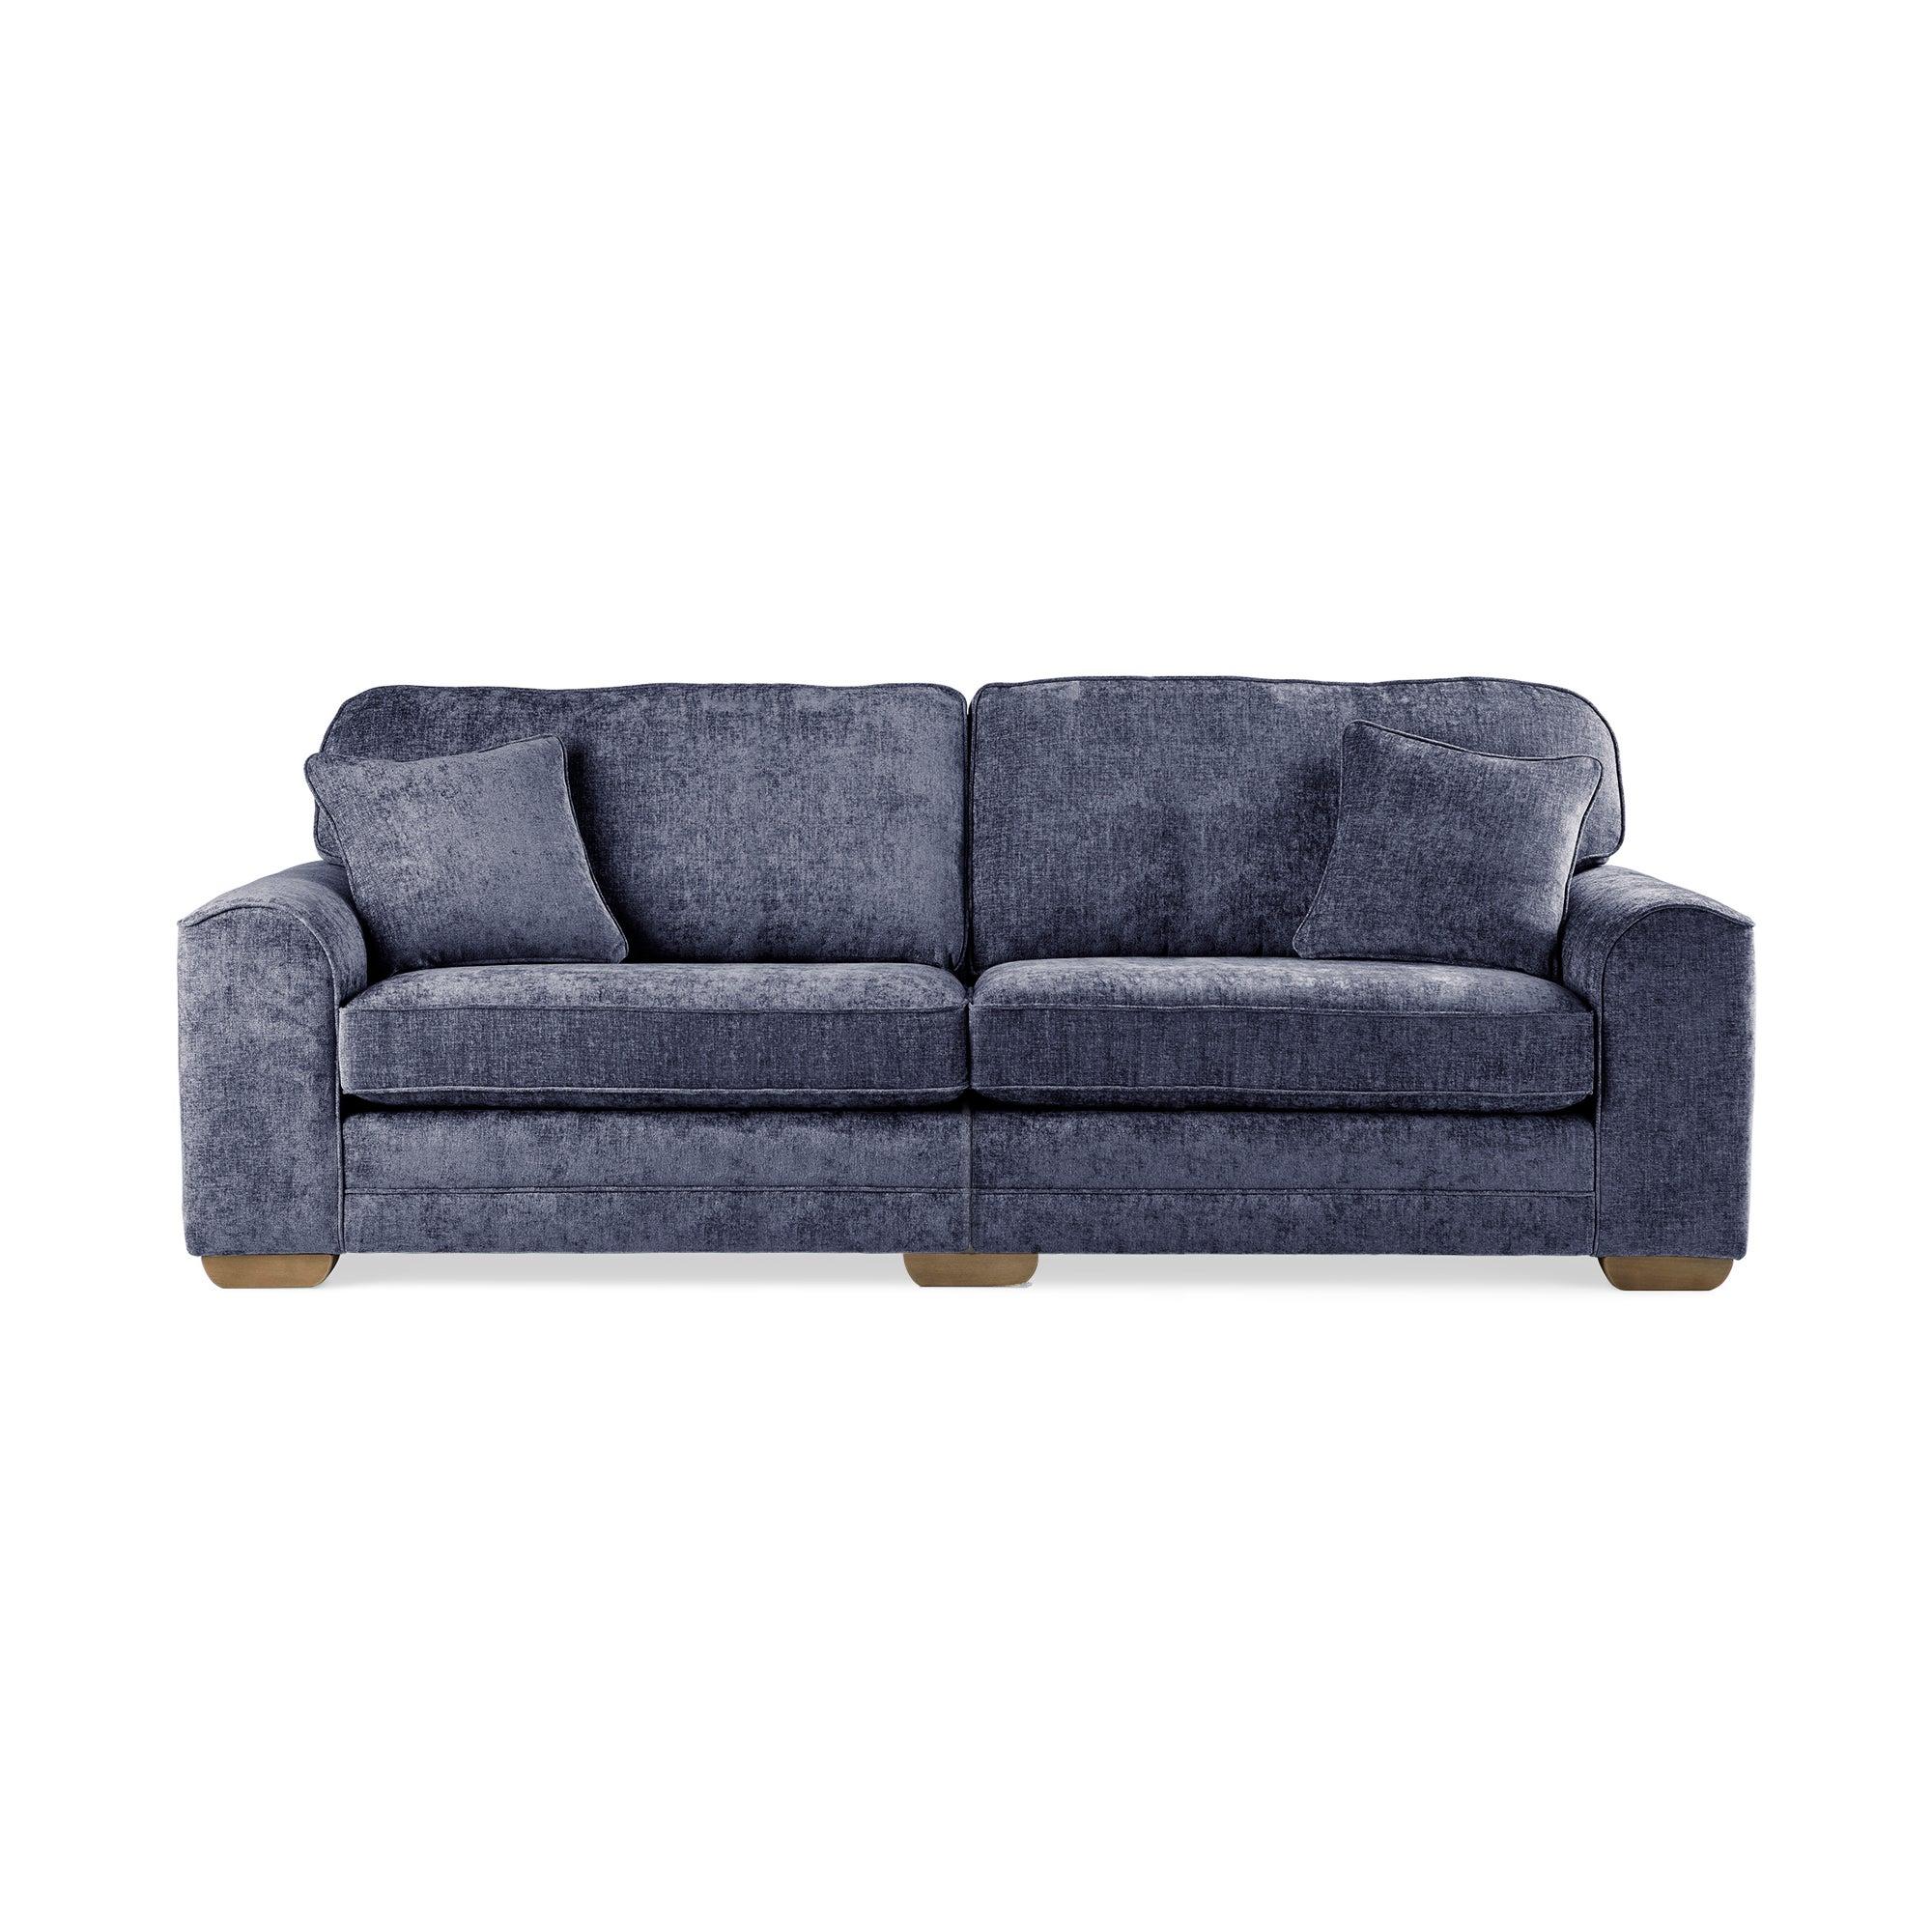 Morello 4 Seater Sofa Luxury Chenille Navy Blue